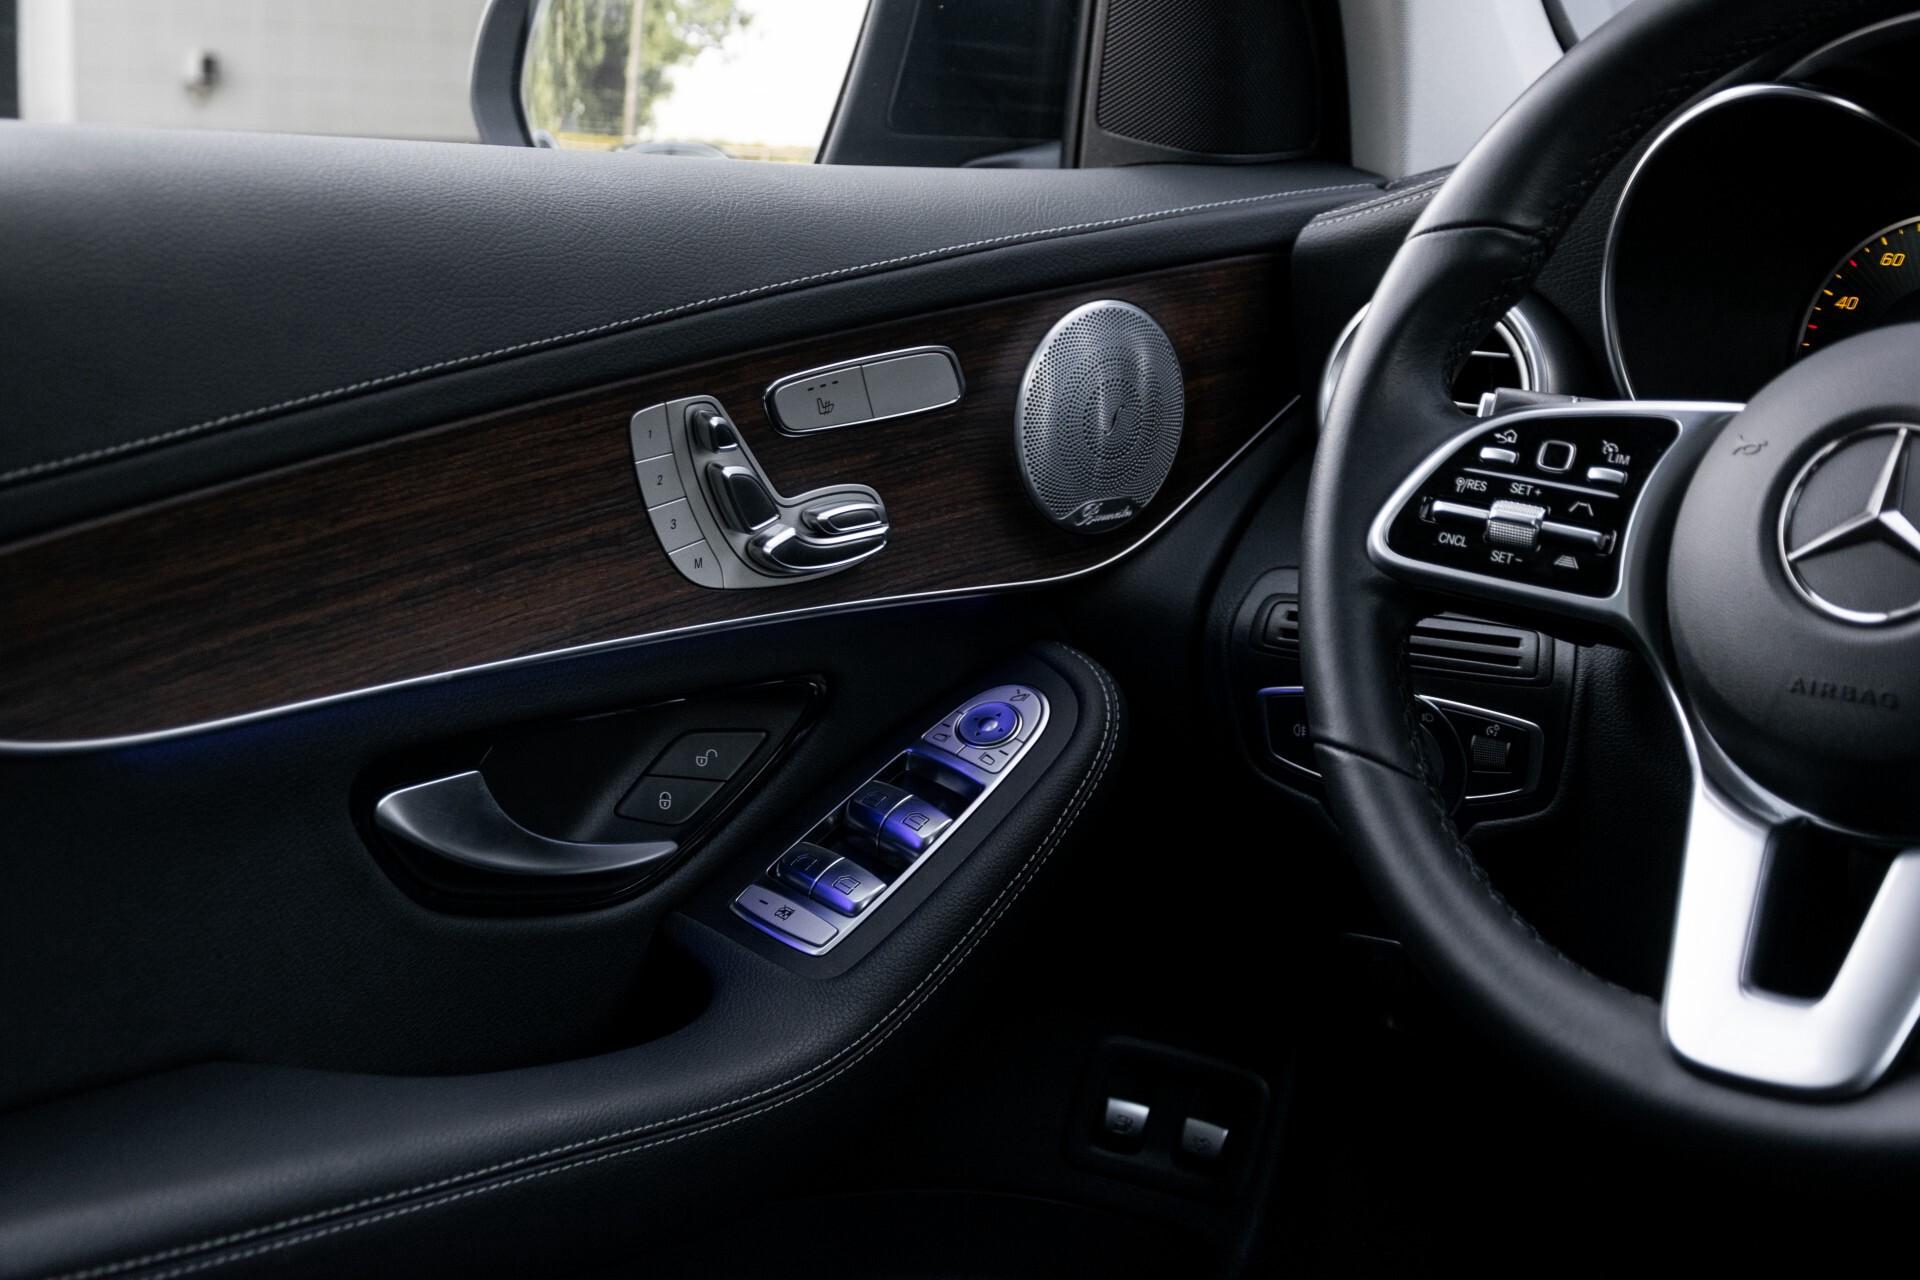 Mercedes-Benz GLC 300e 4-M Luchtvering/Panorama/Multicontourstoelen/Rij-assistentie/Standkachel Aut9 Foto 49